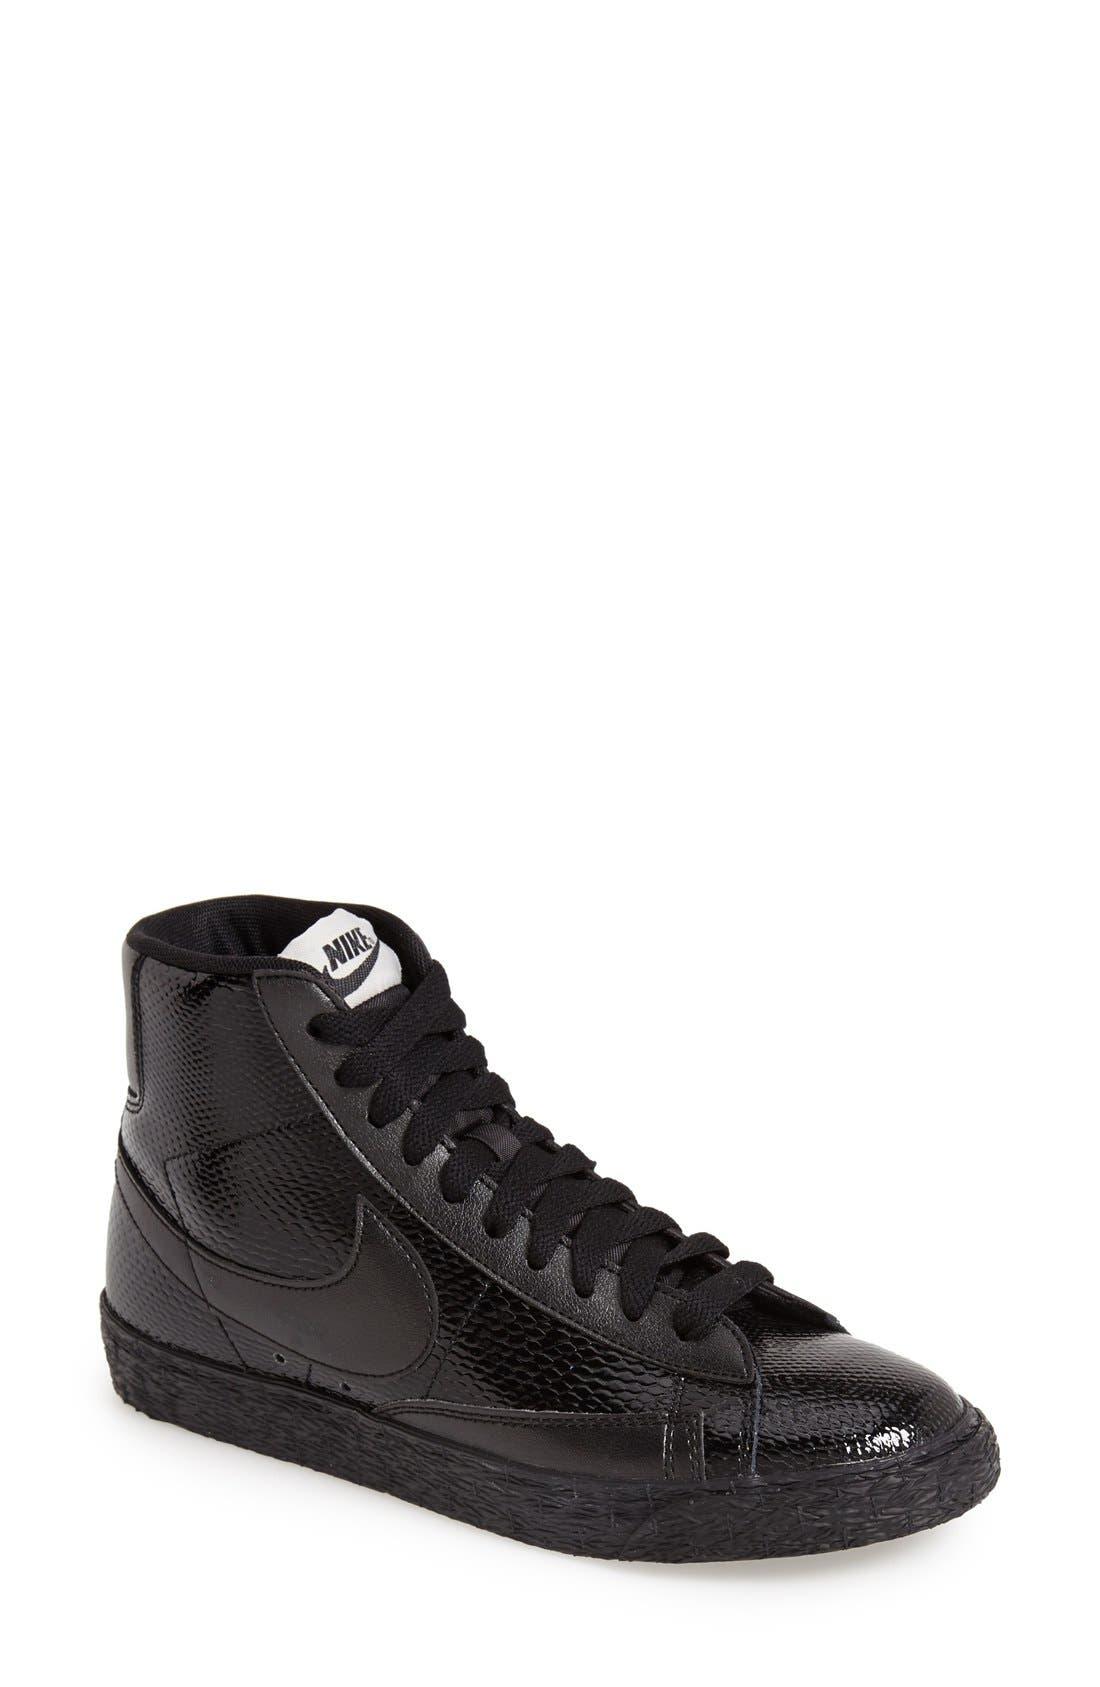 Alternate Image 1 Selected - Nike 'Blazer Mid' Sneaker (Women)